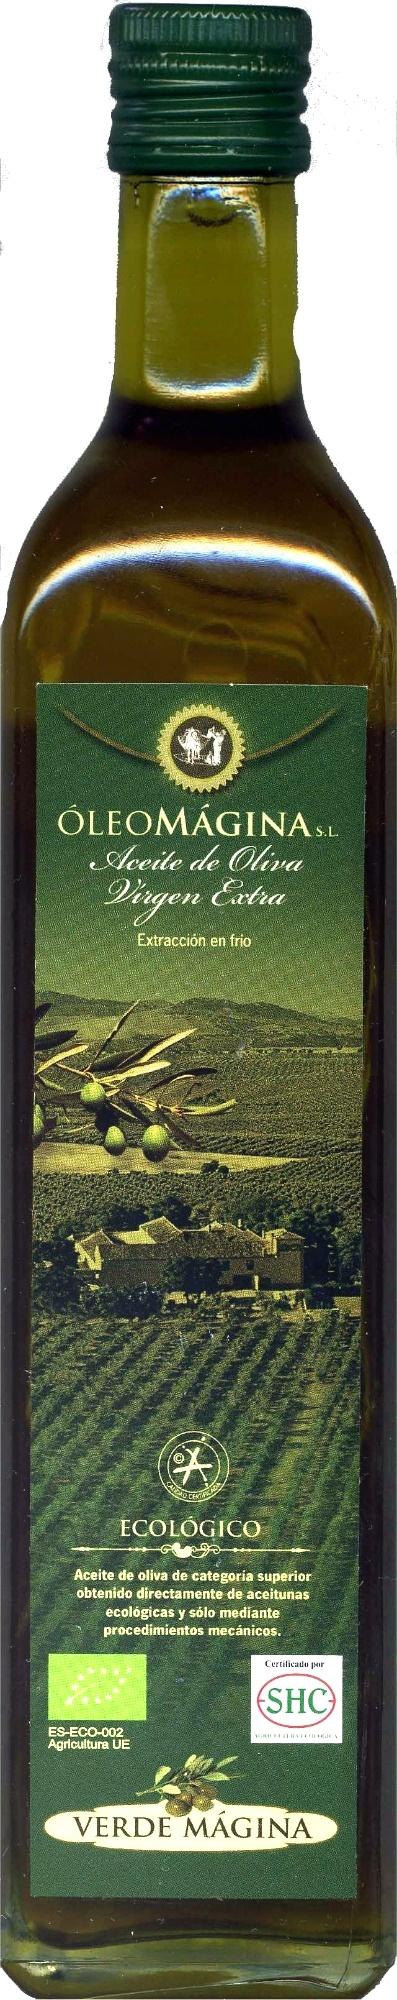 "Aceite de oliva virgen extra ecológico ""Verde Mágina"" - Producte"